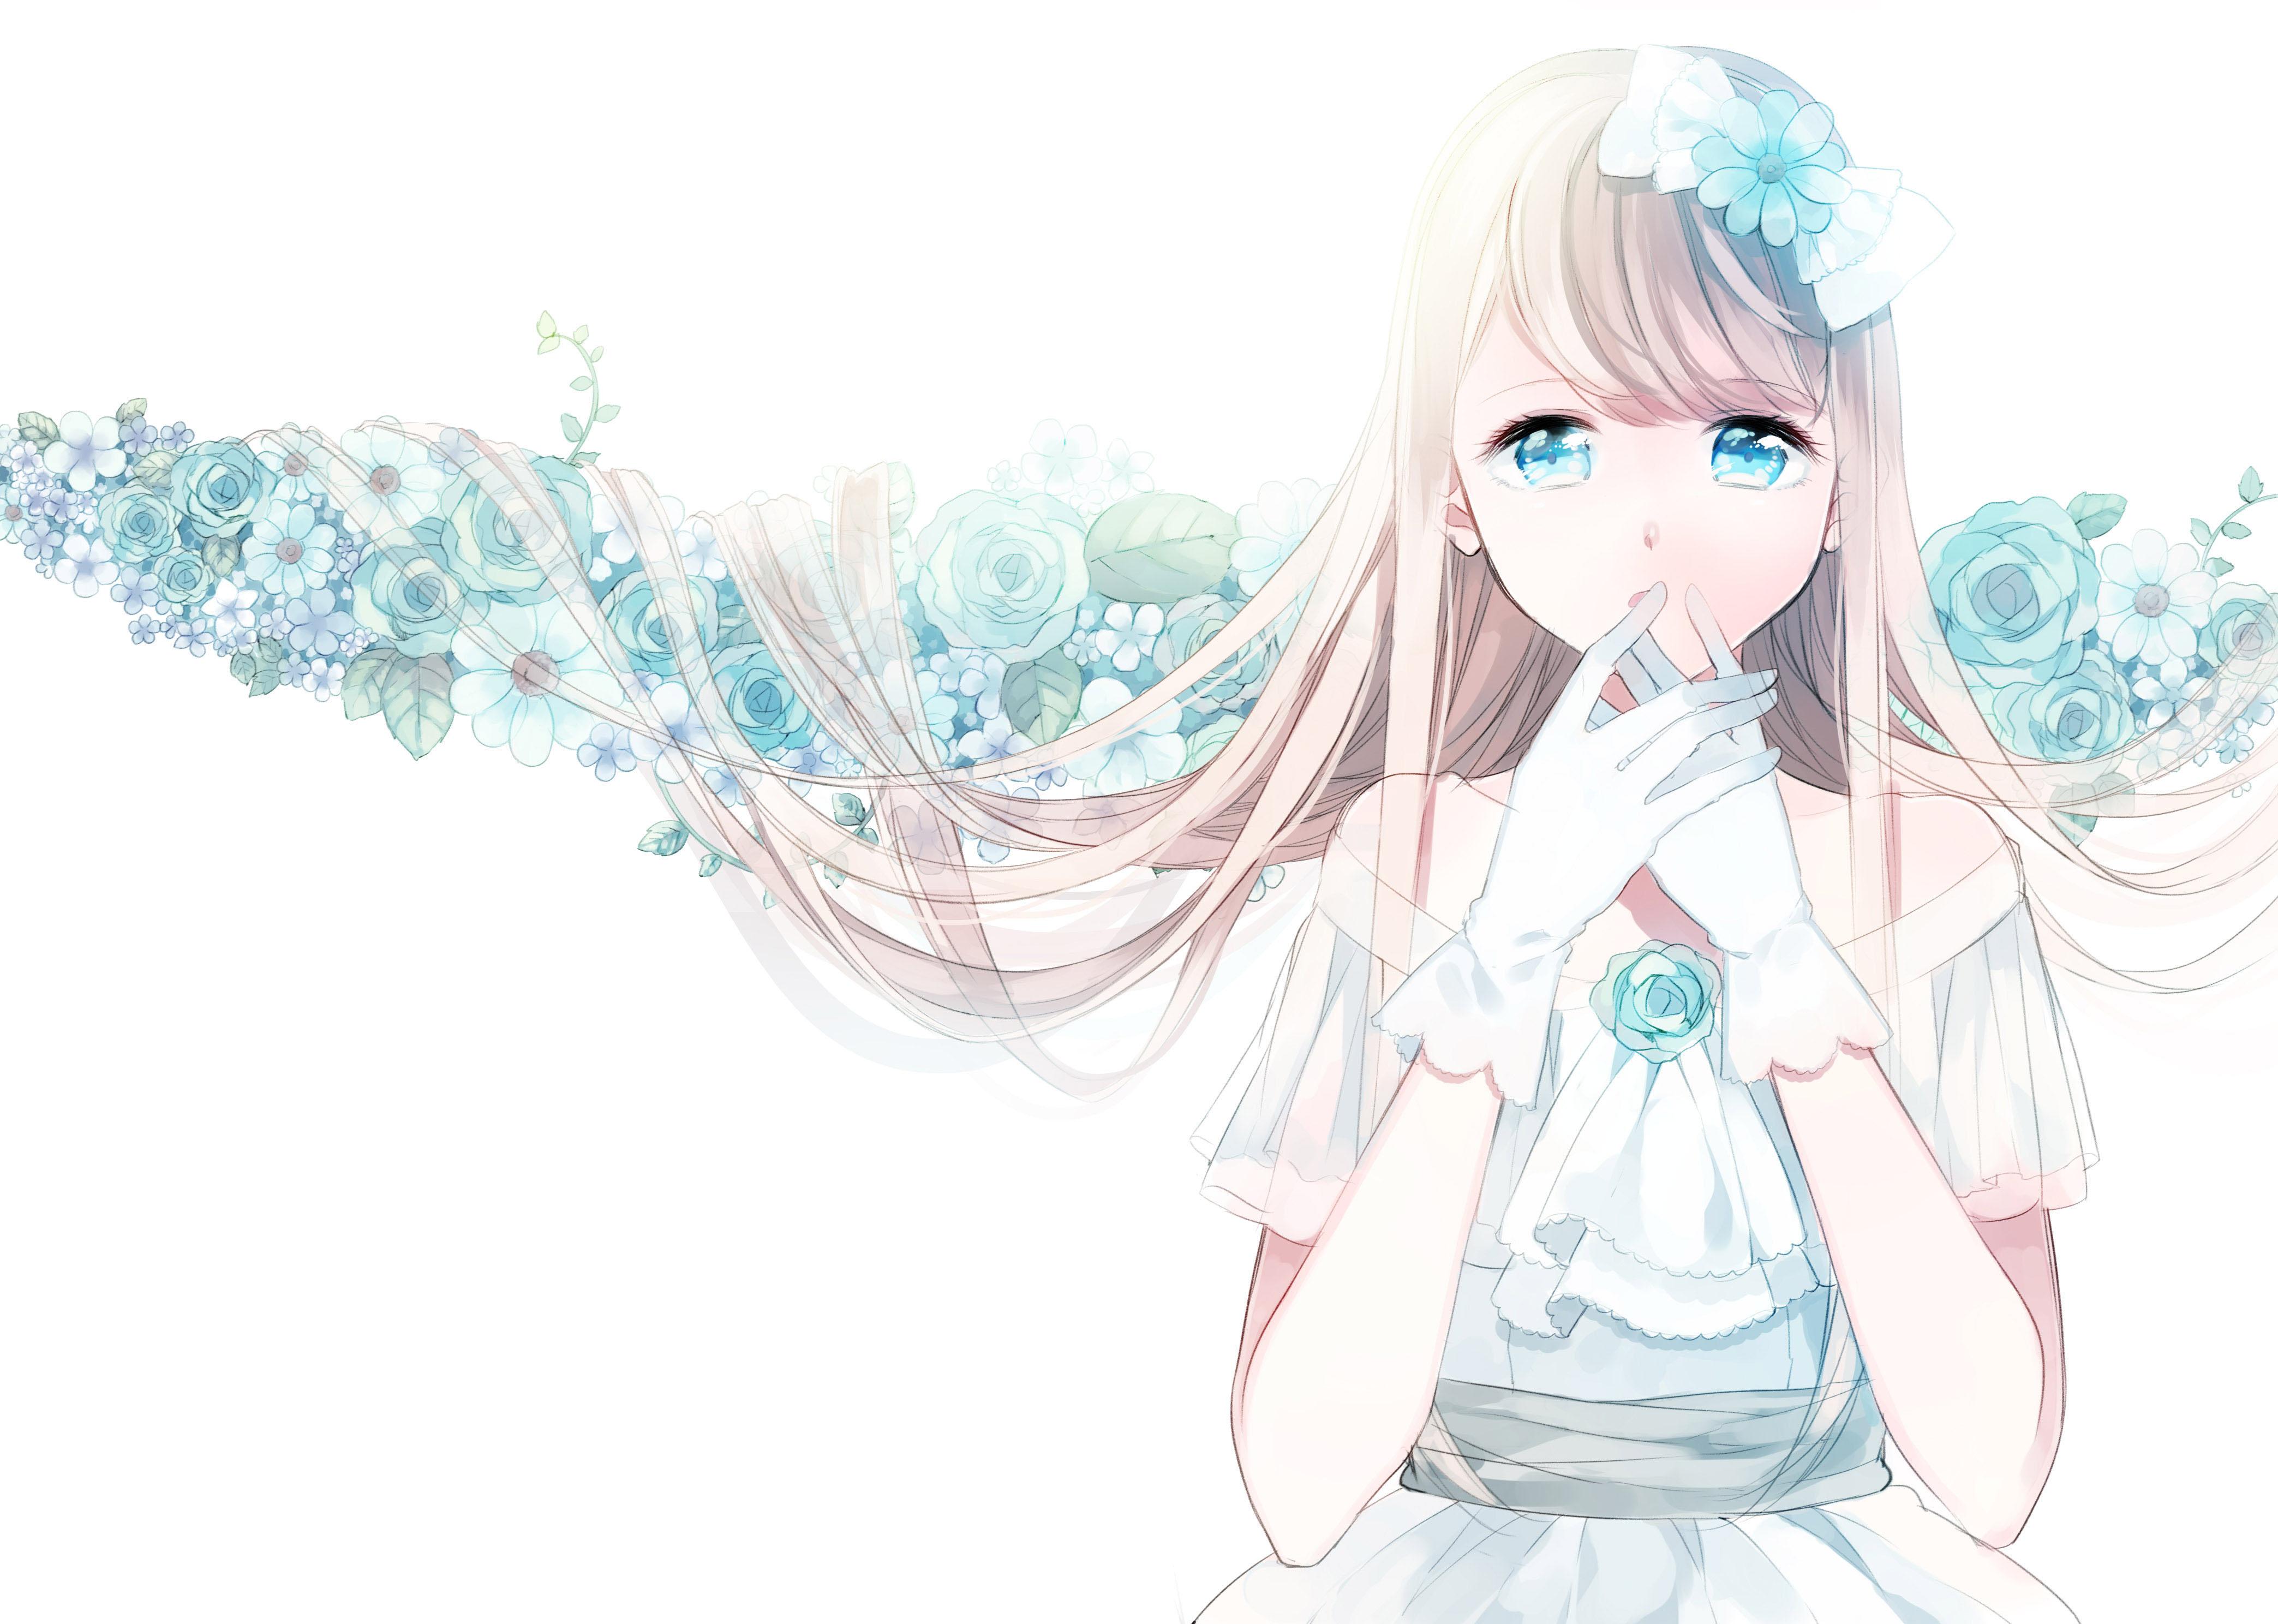 Cute Anime Girl Wallpaper Cute Anime Wallpaper Blue 931787